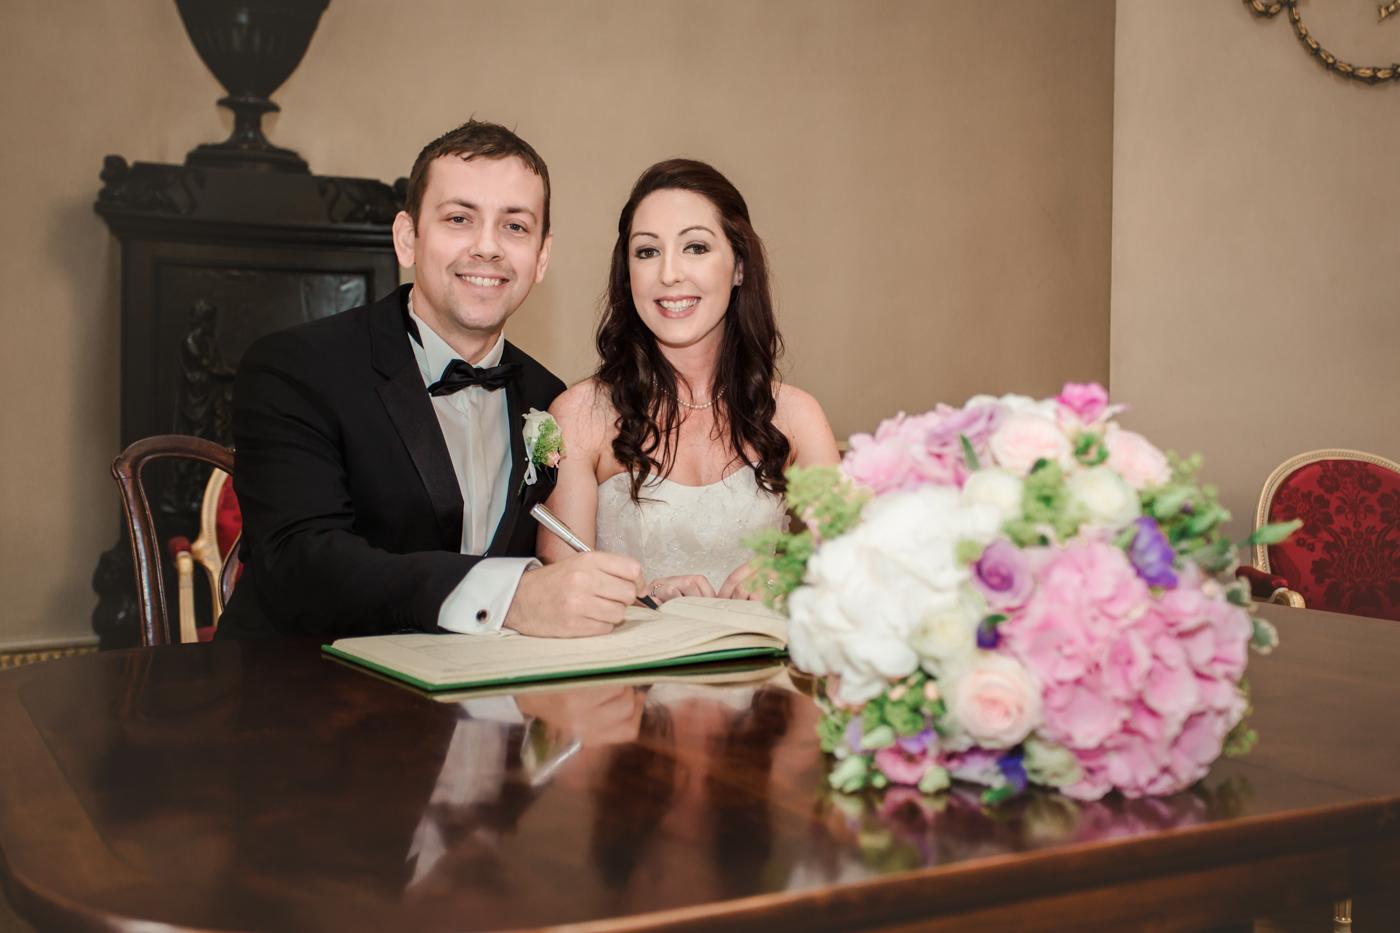 073 - Abi and Chris at Kedleston Hall - Wedding Photography by Mark Pugh www.markpugh.com - 0214.JPG